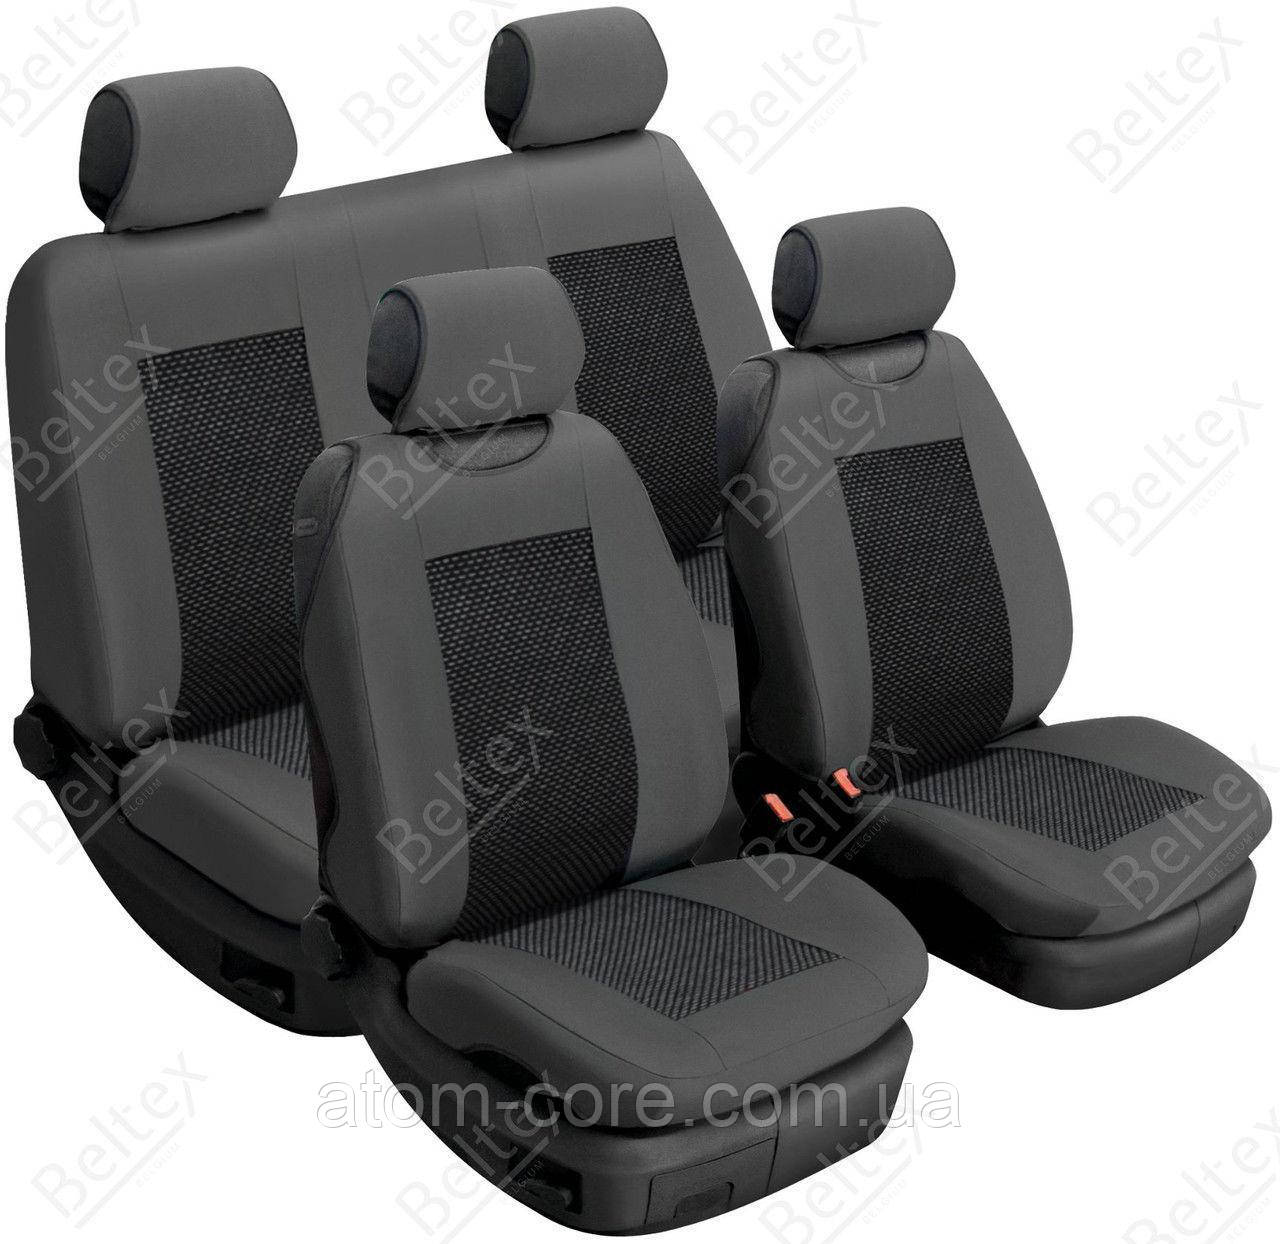 Майки/чехлы на сиденья Мазда СХ 9 (Mazda CX-9)